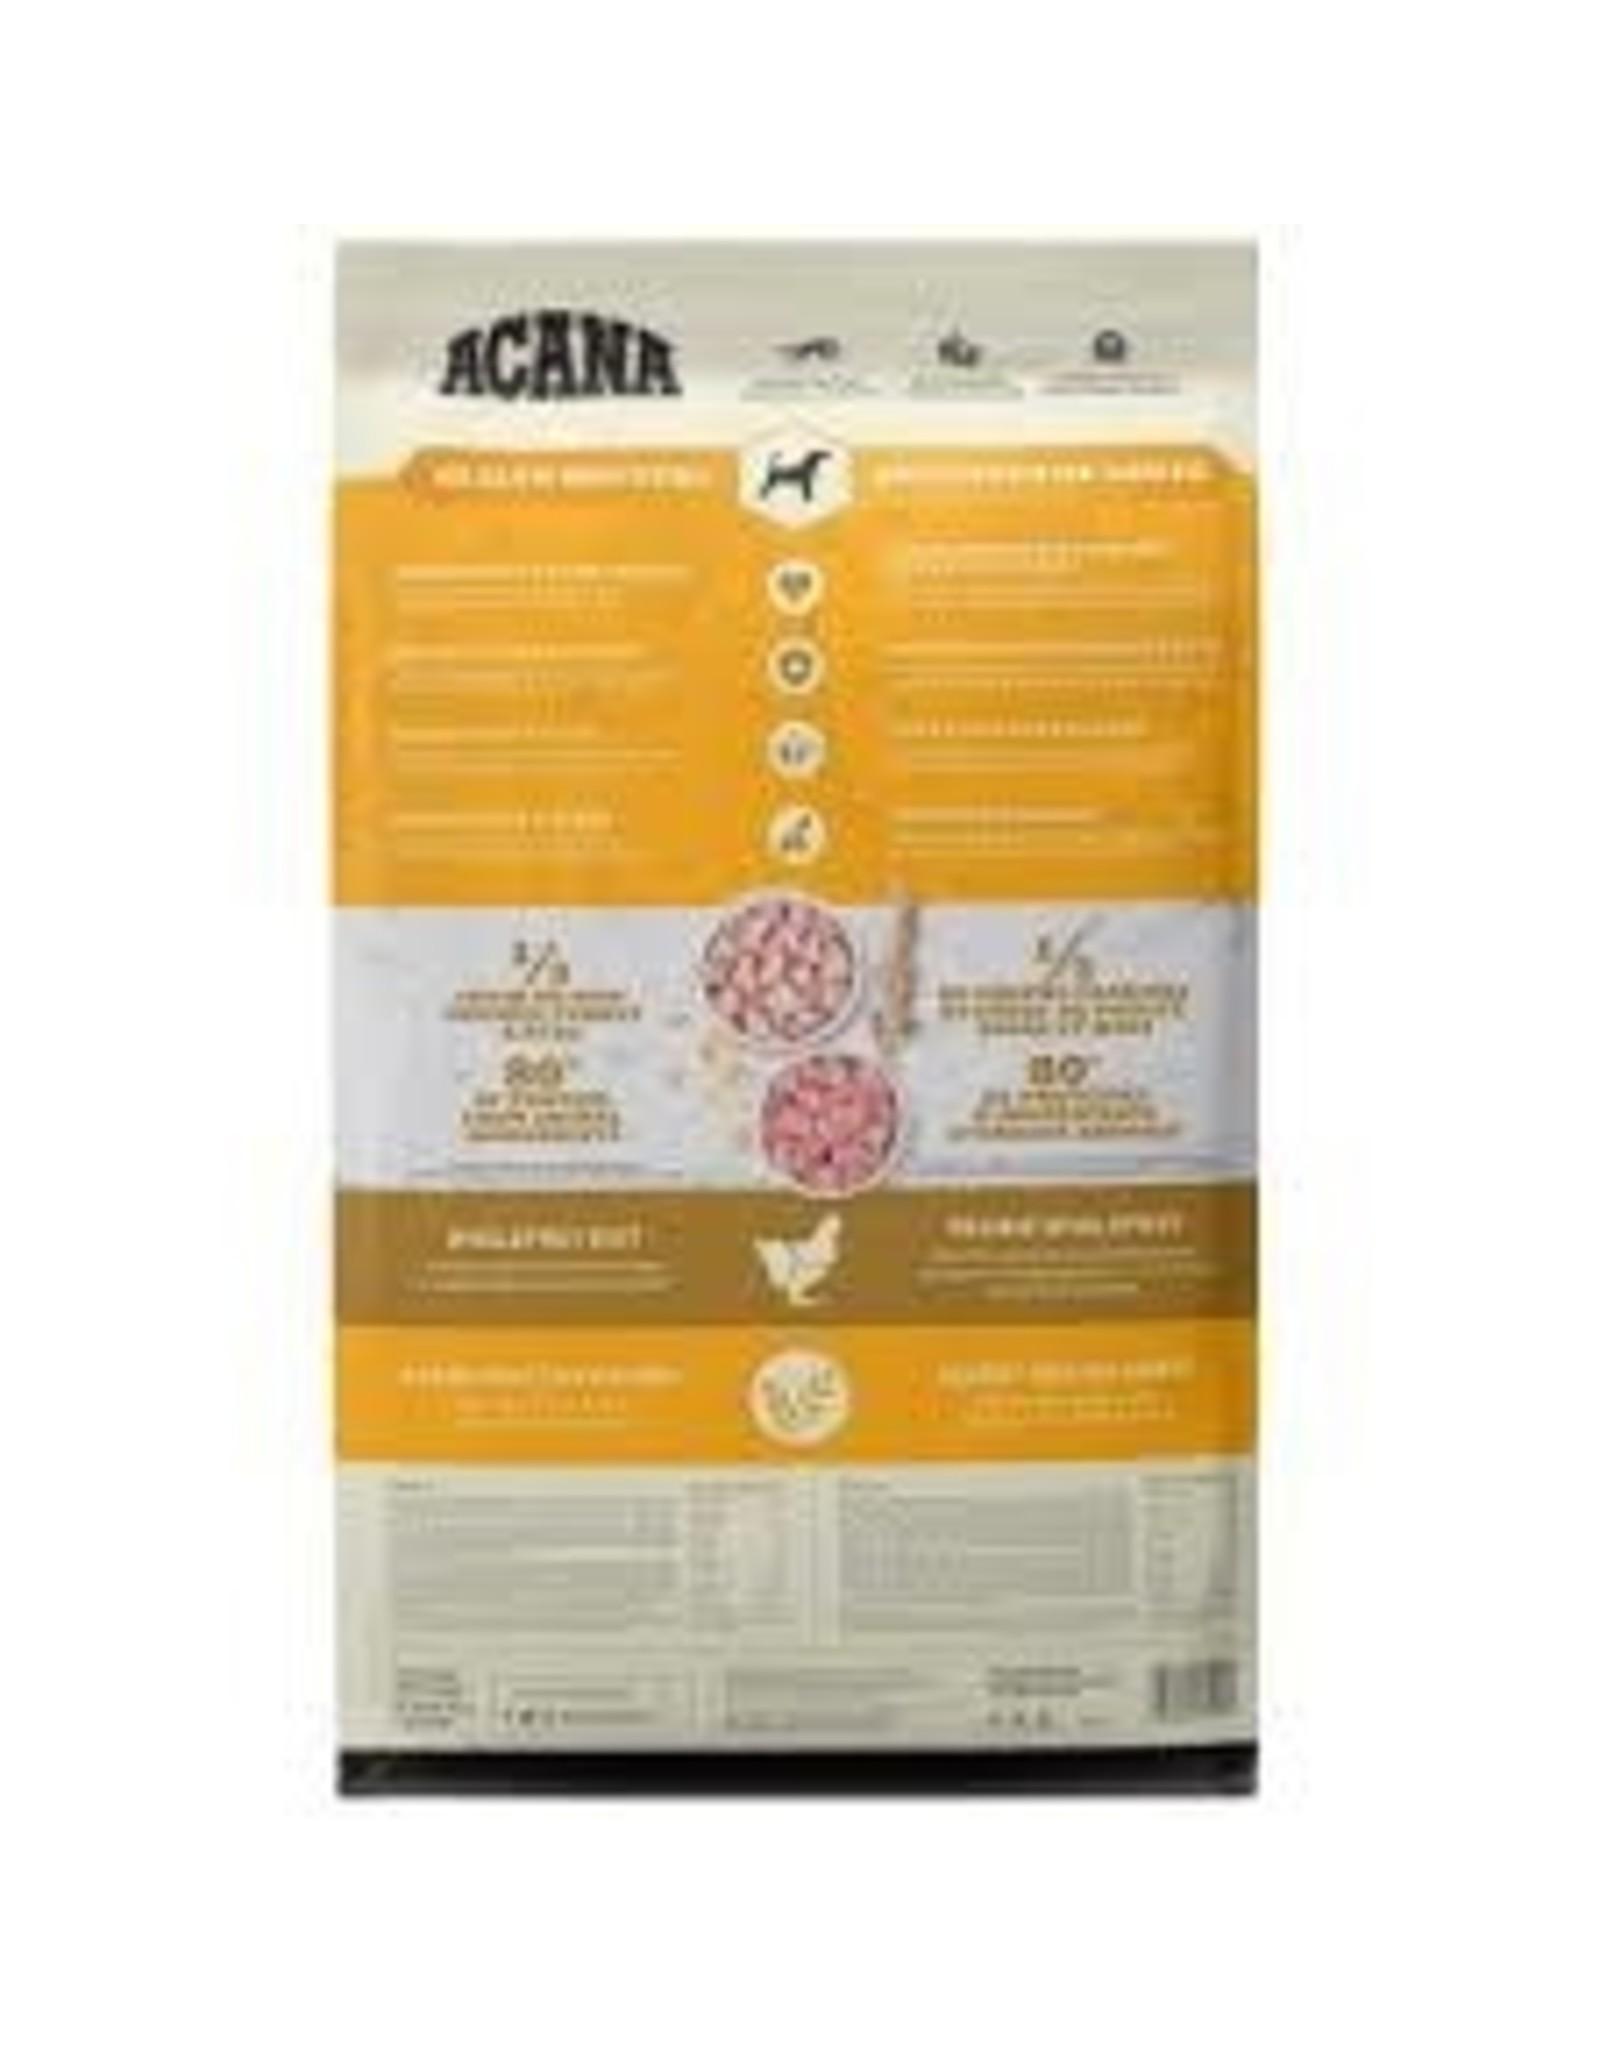 ACANA ACANA HealthyGrains - Free-Run Poultry 1.8kg